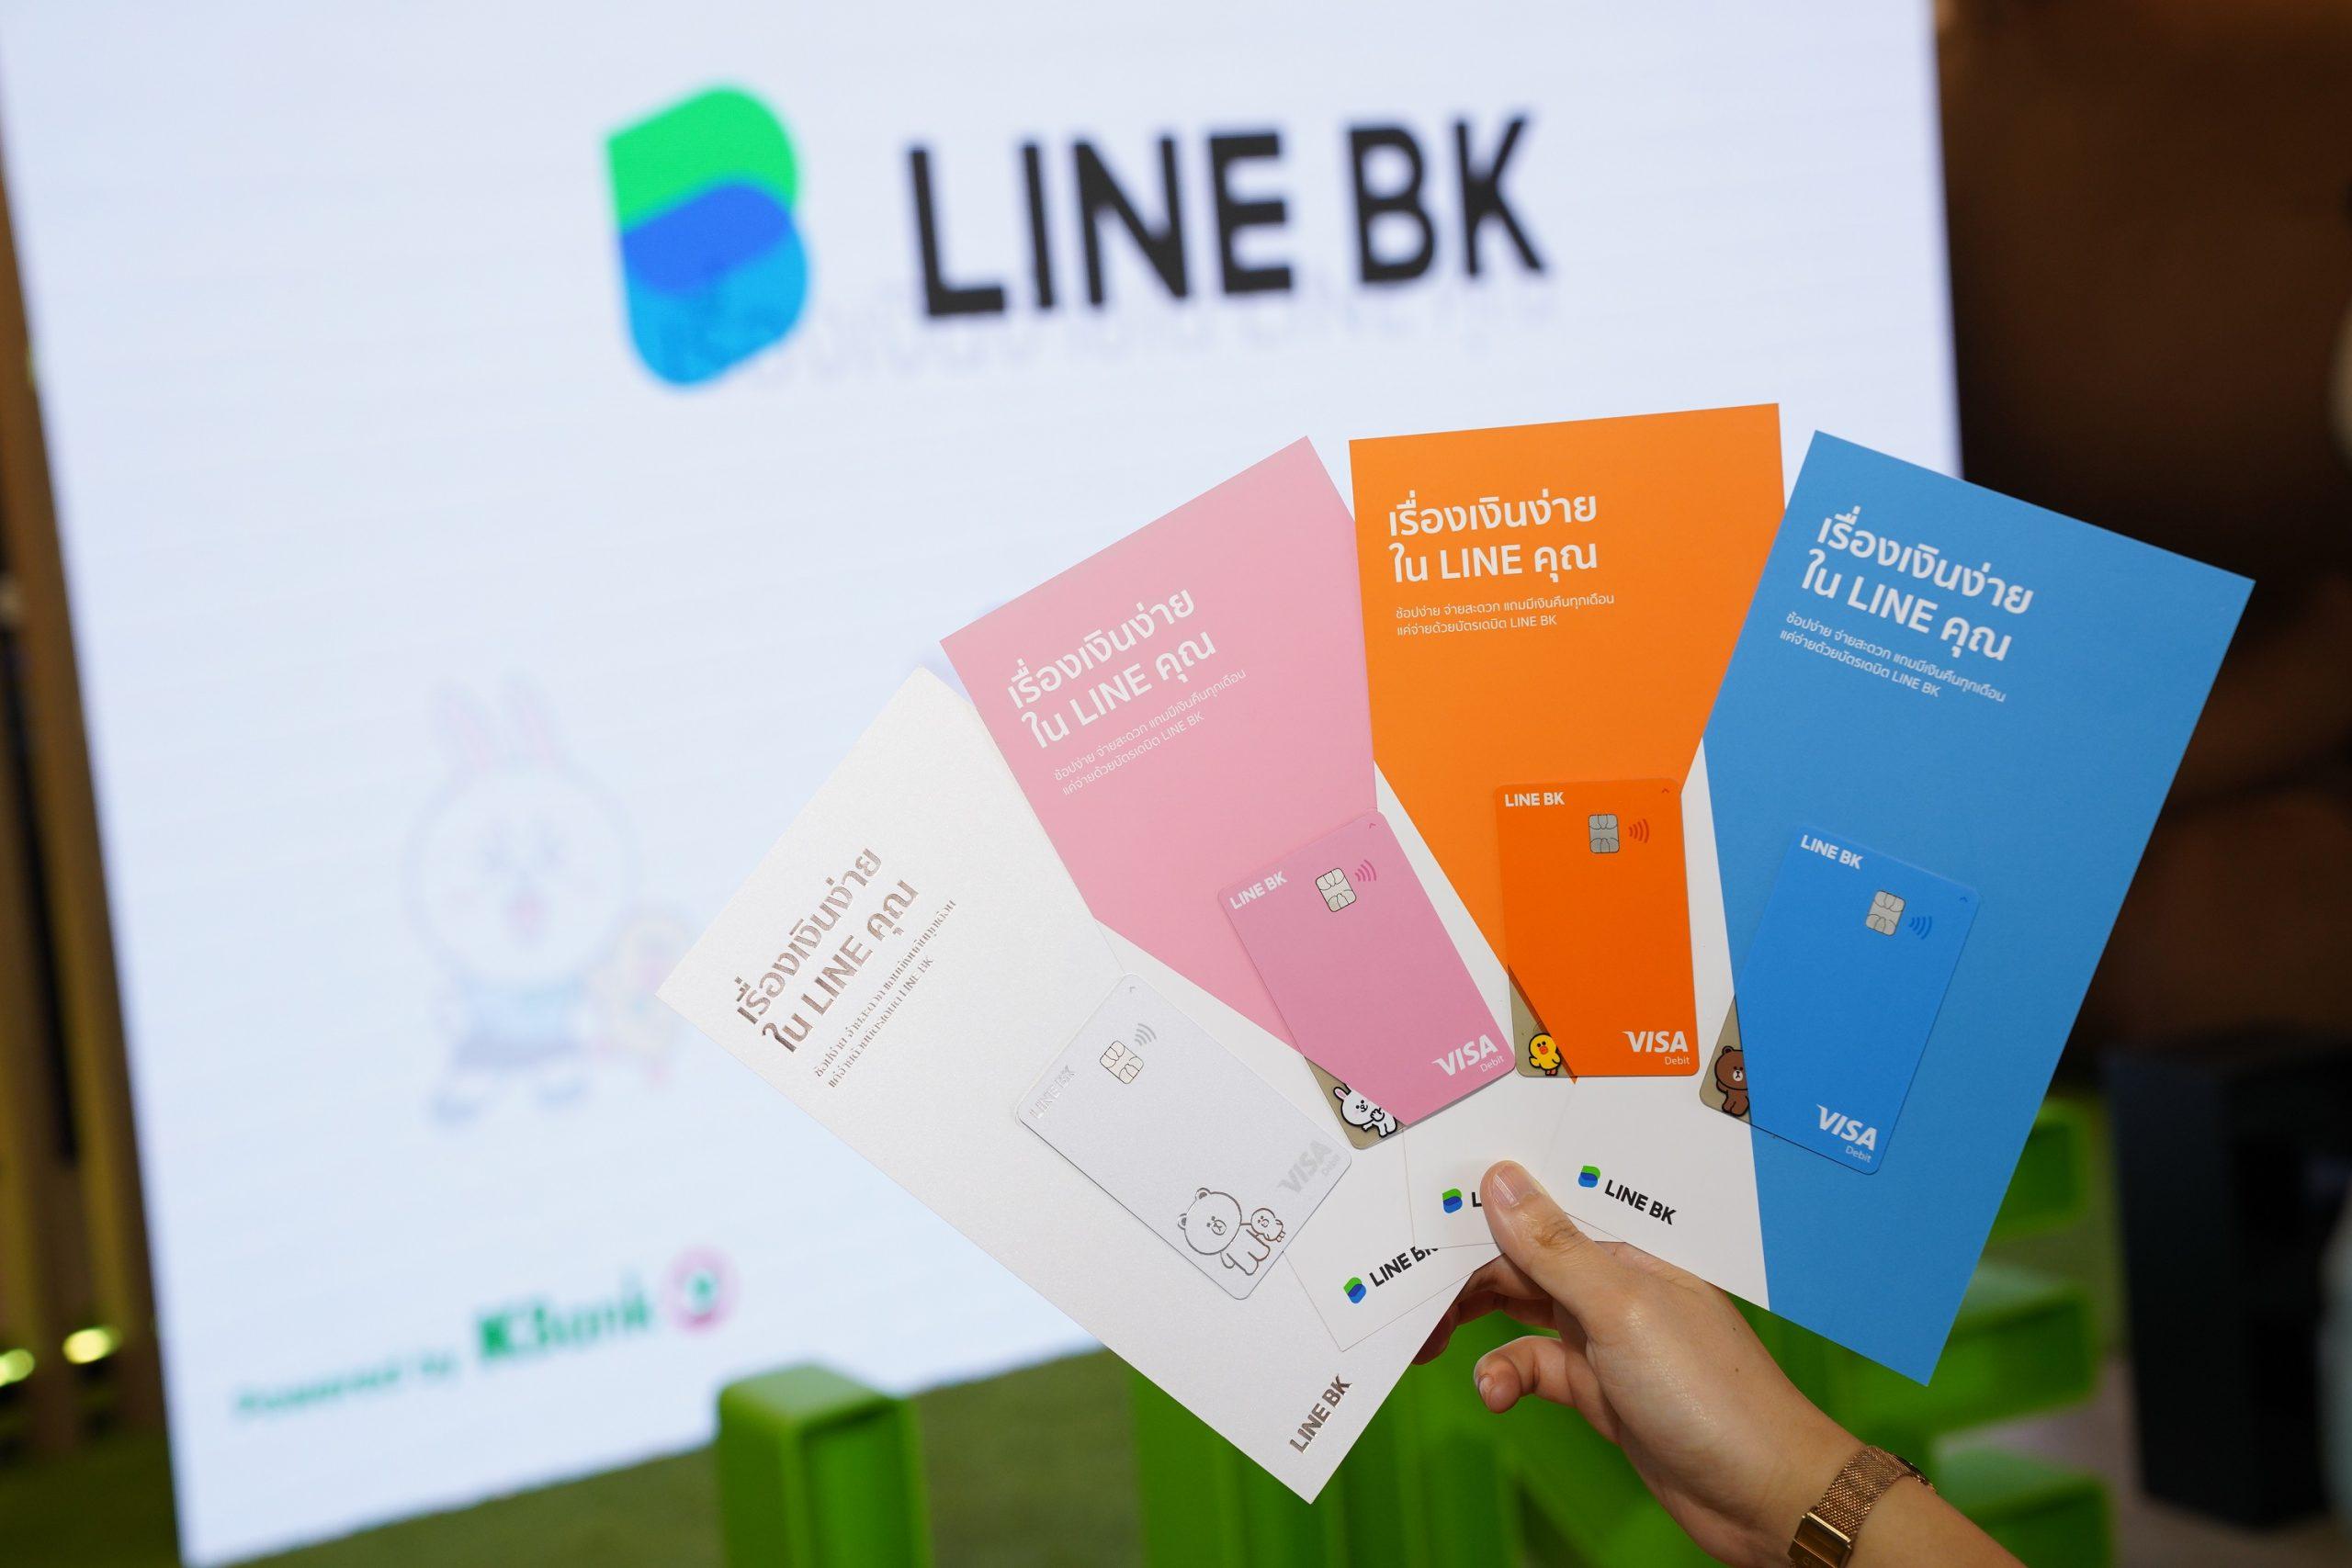 LINE BK LINE FRIENDS บัตรเดบิต